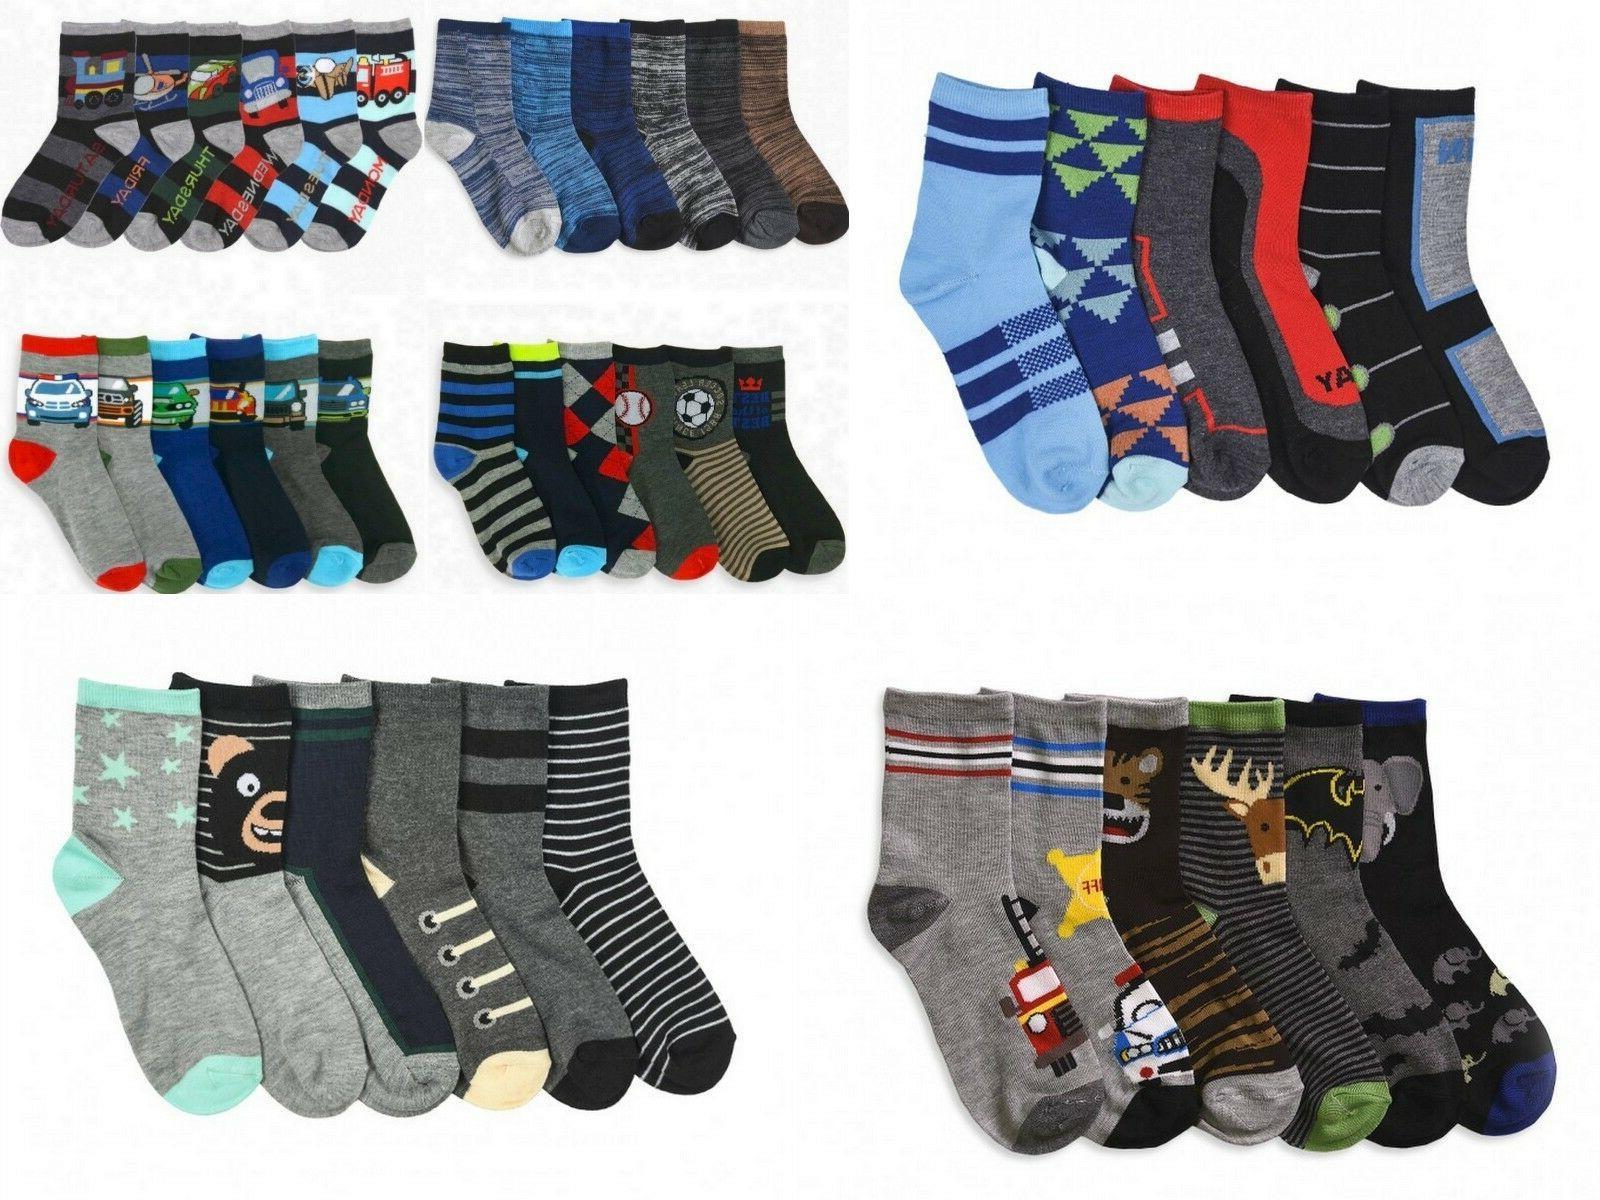 6 Pairs Boys Crew Socks Toddler, Little Kid or Big Kid Sizes